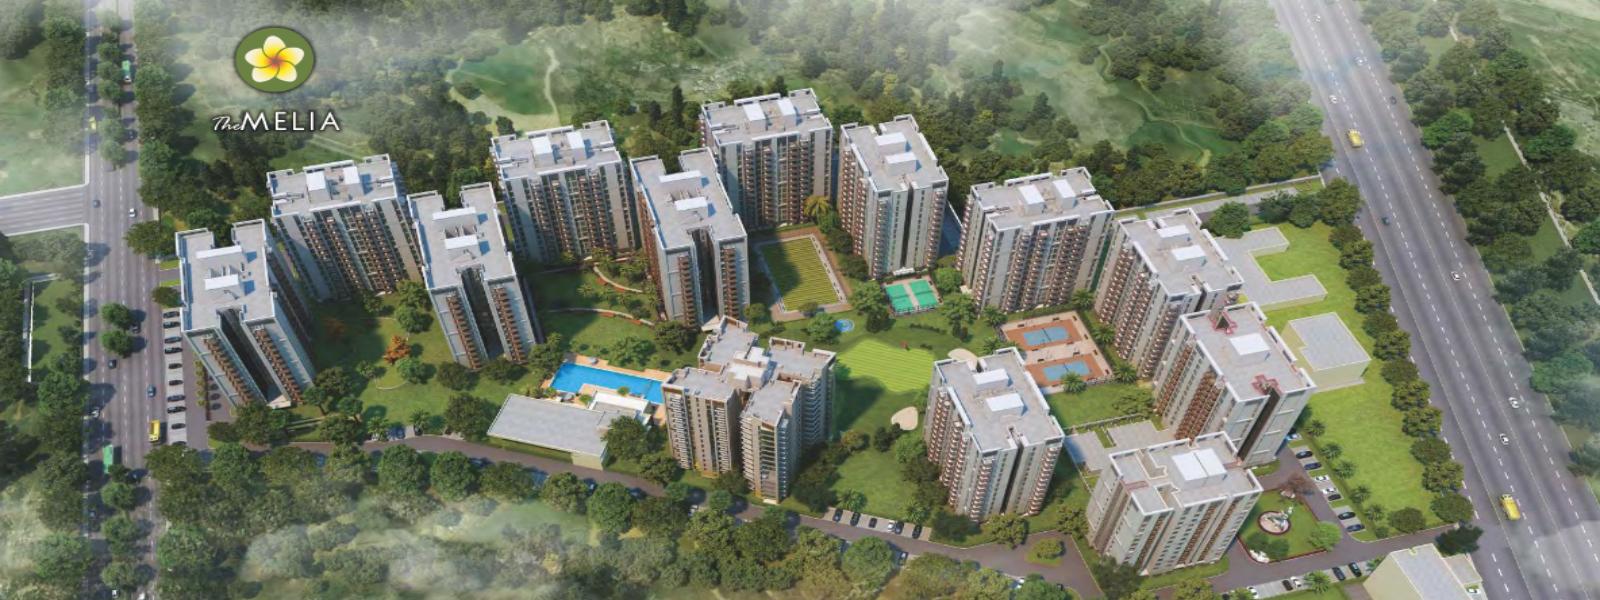 The Melia Residential Apartments in Sohna Gurgaon